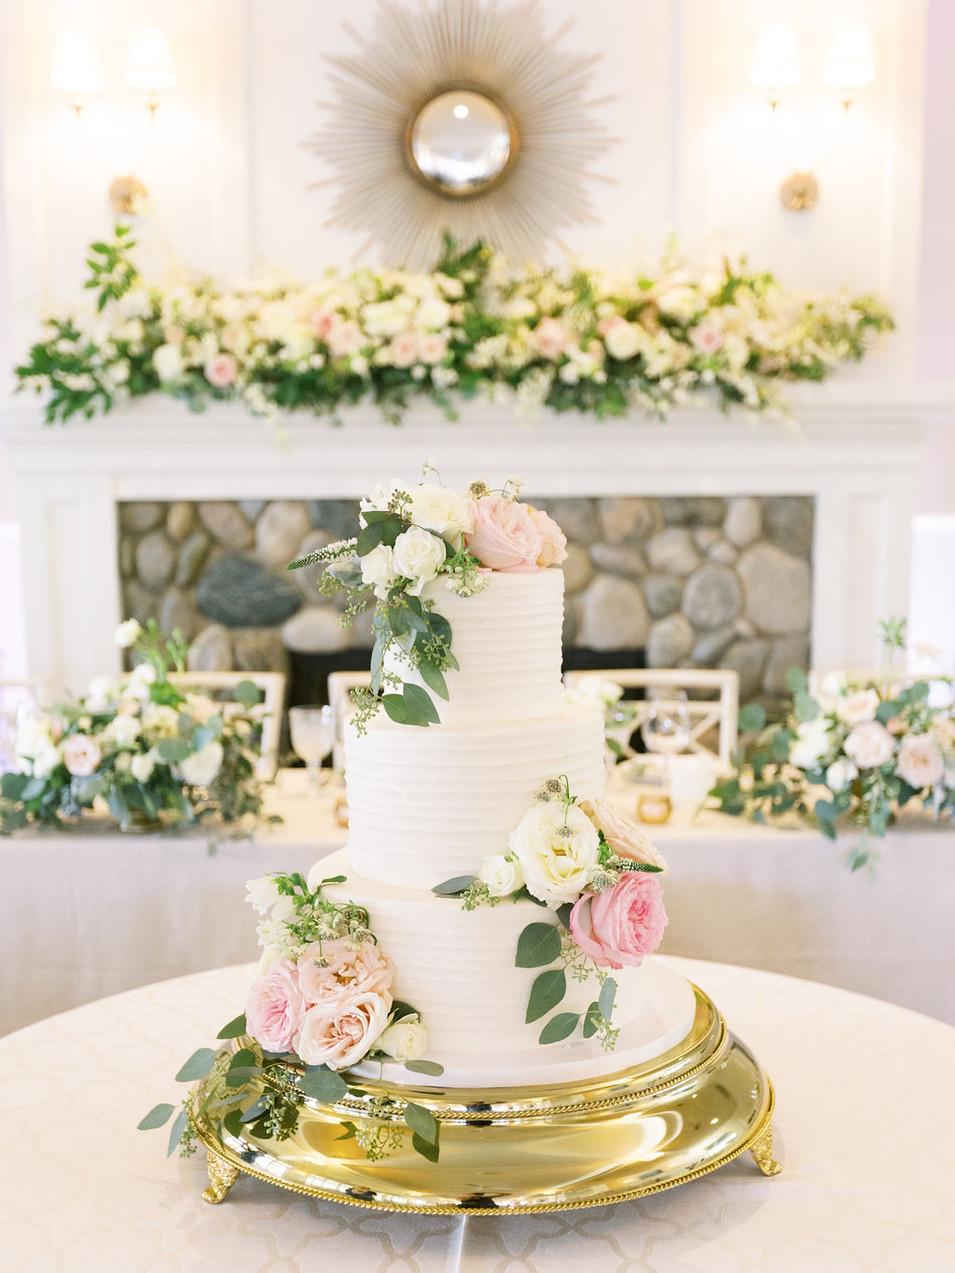 clark+wedding+reception-49.jpg